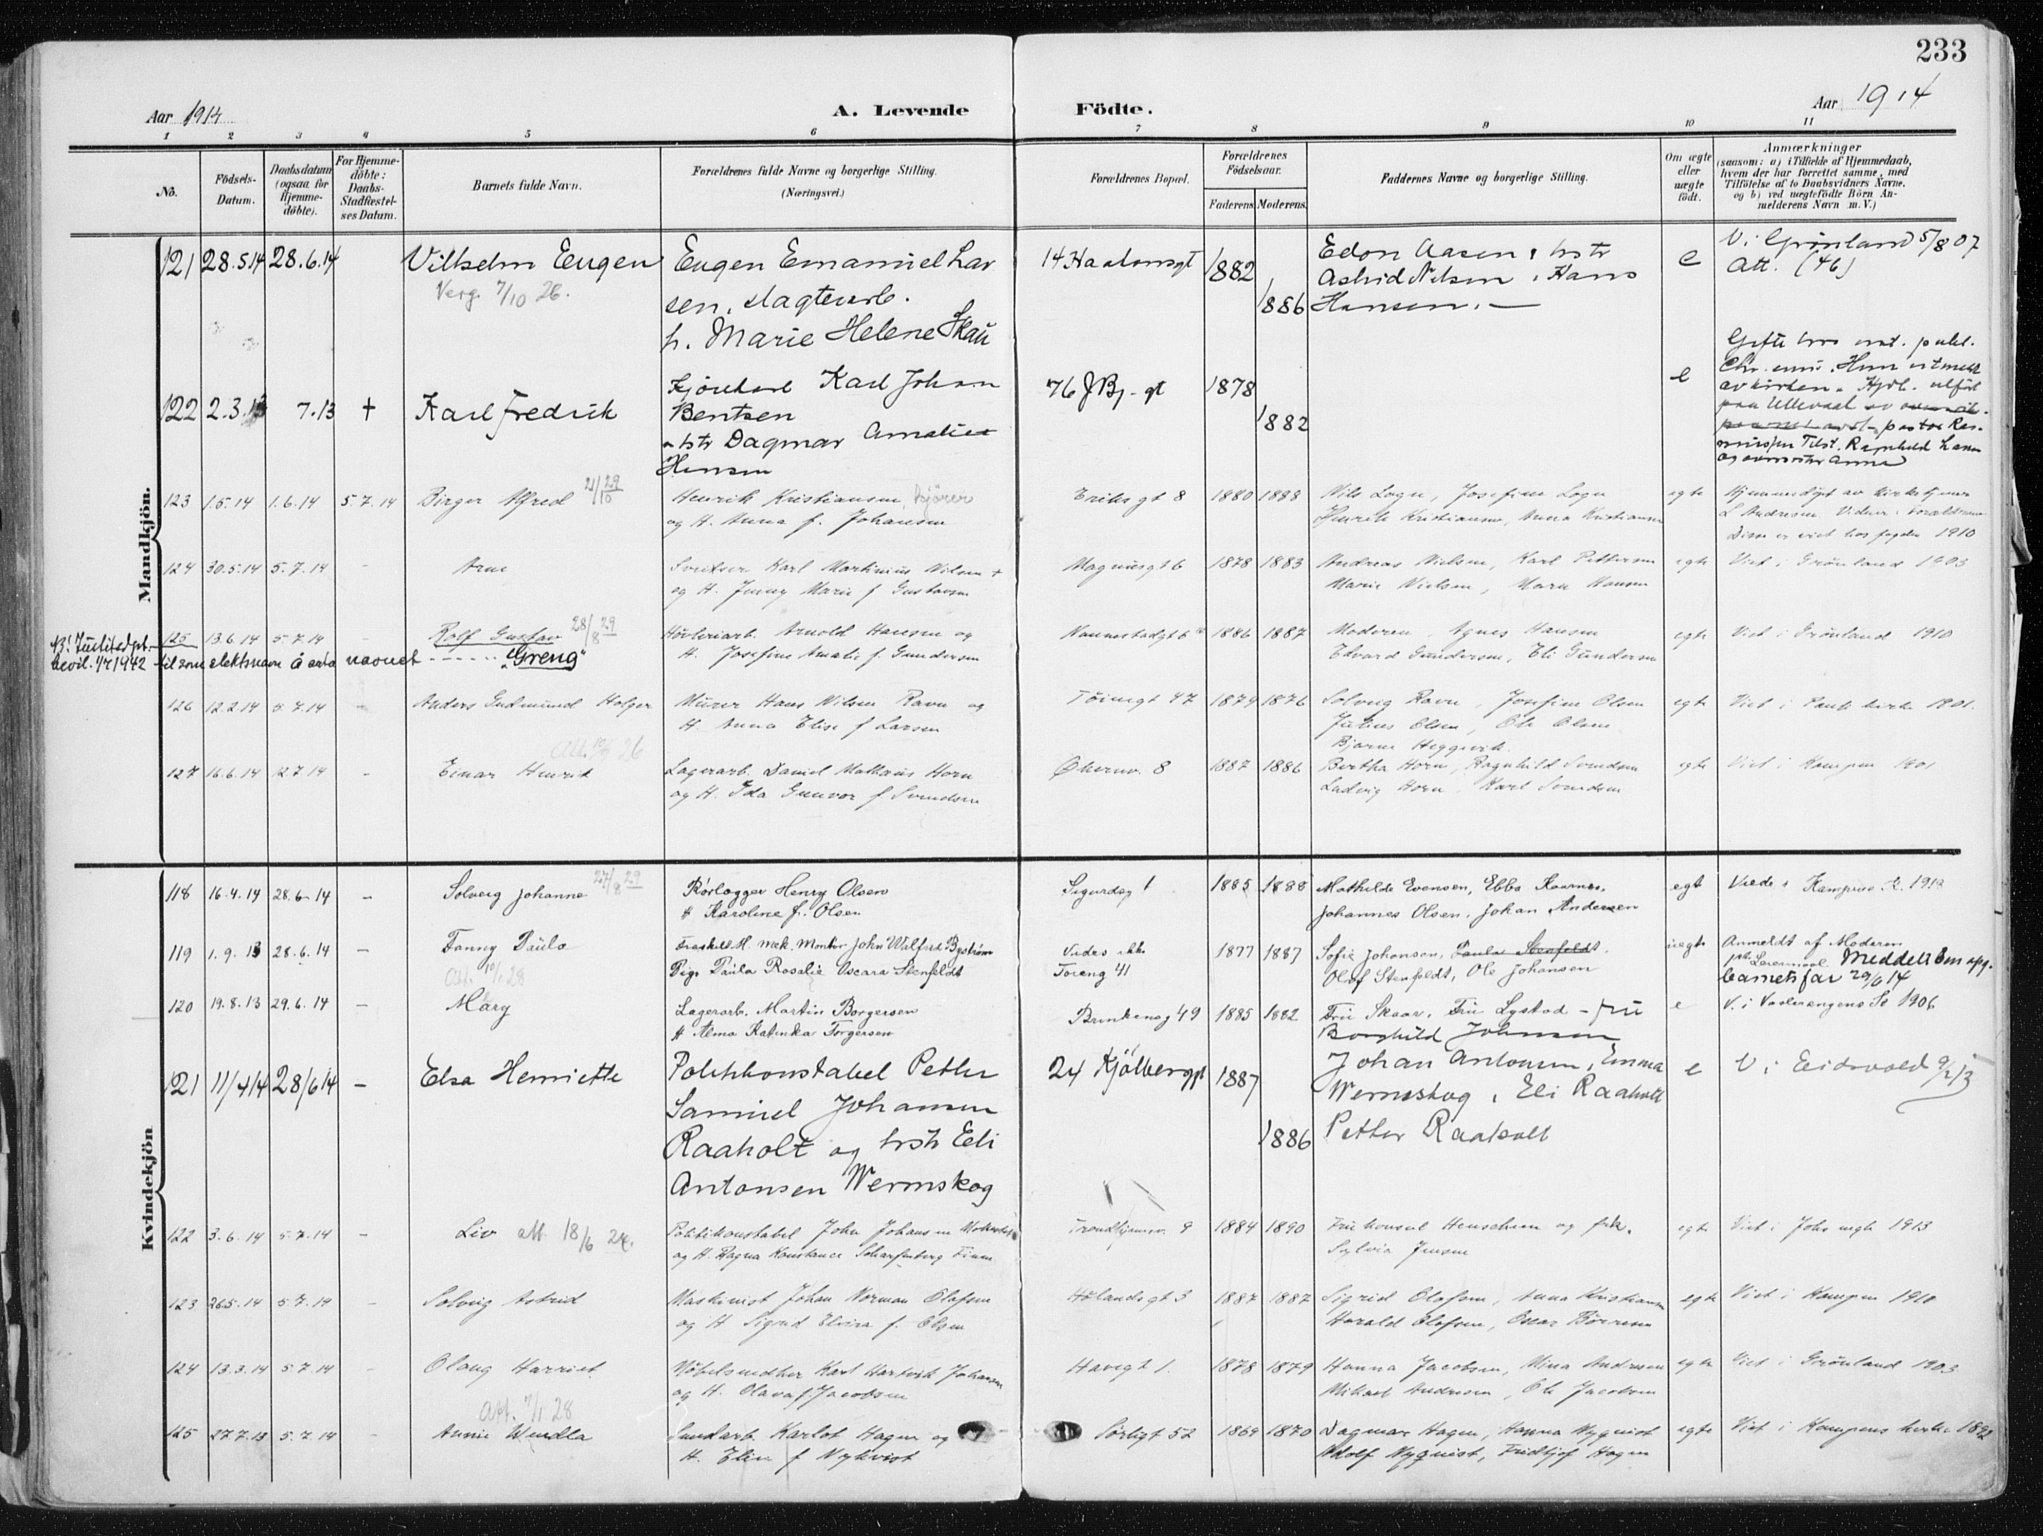 SAO, Kampen prestekontor Kirkebøker, F/Fa/L0010: Ministerialbok nr. I 10, 1905-1917, s. 233